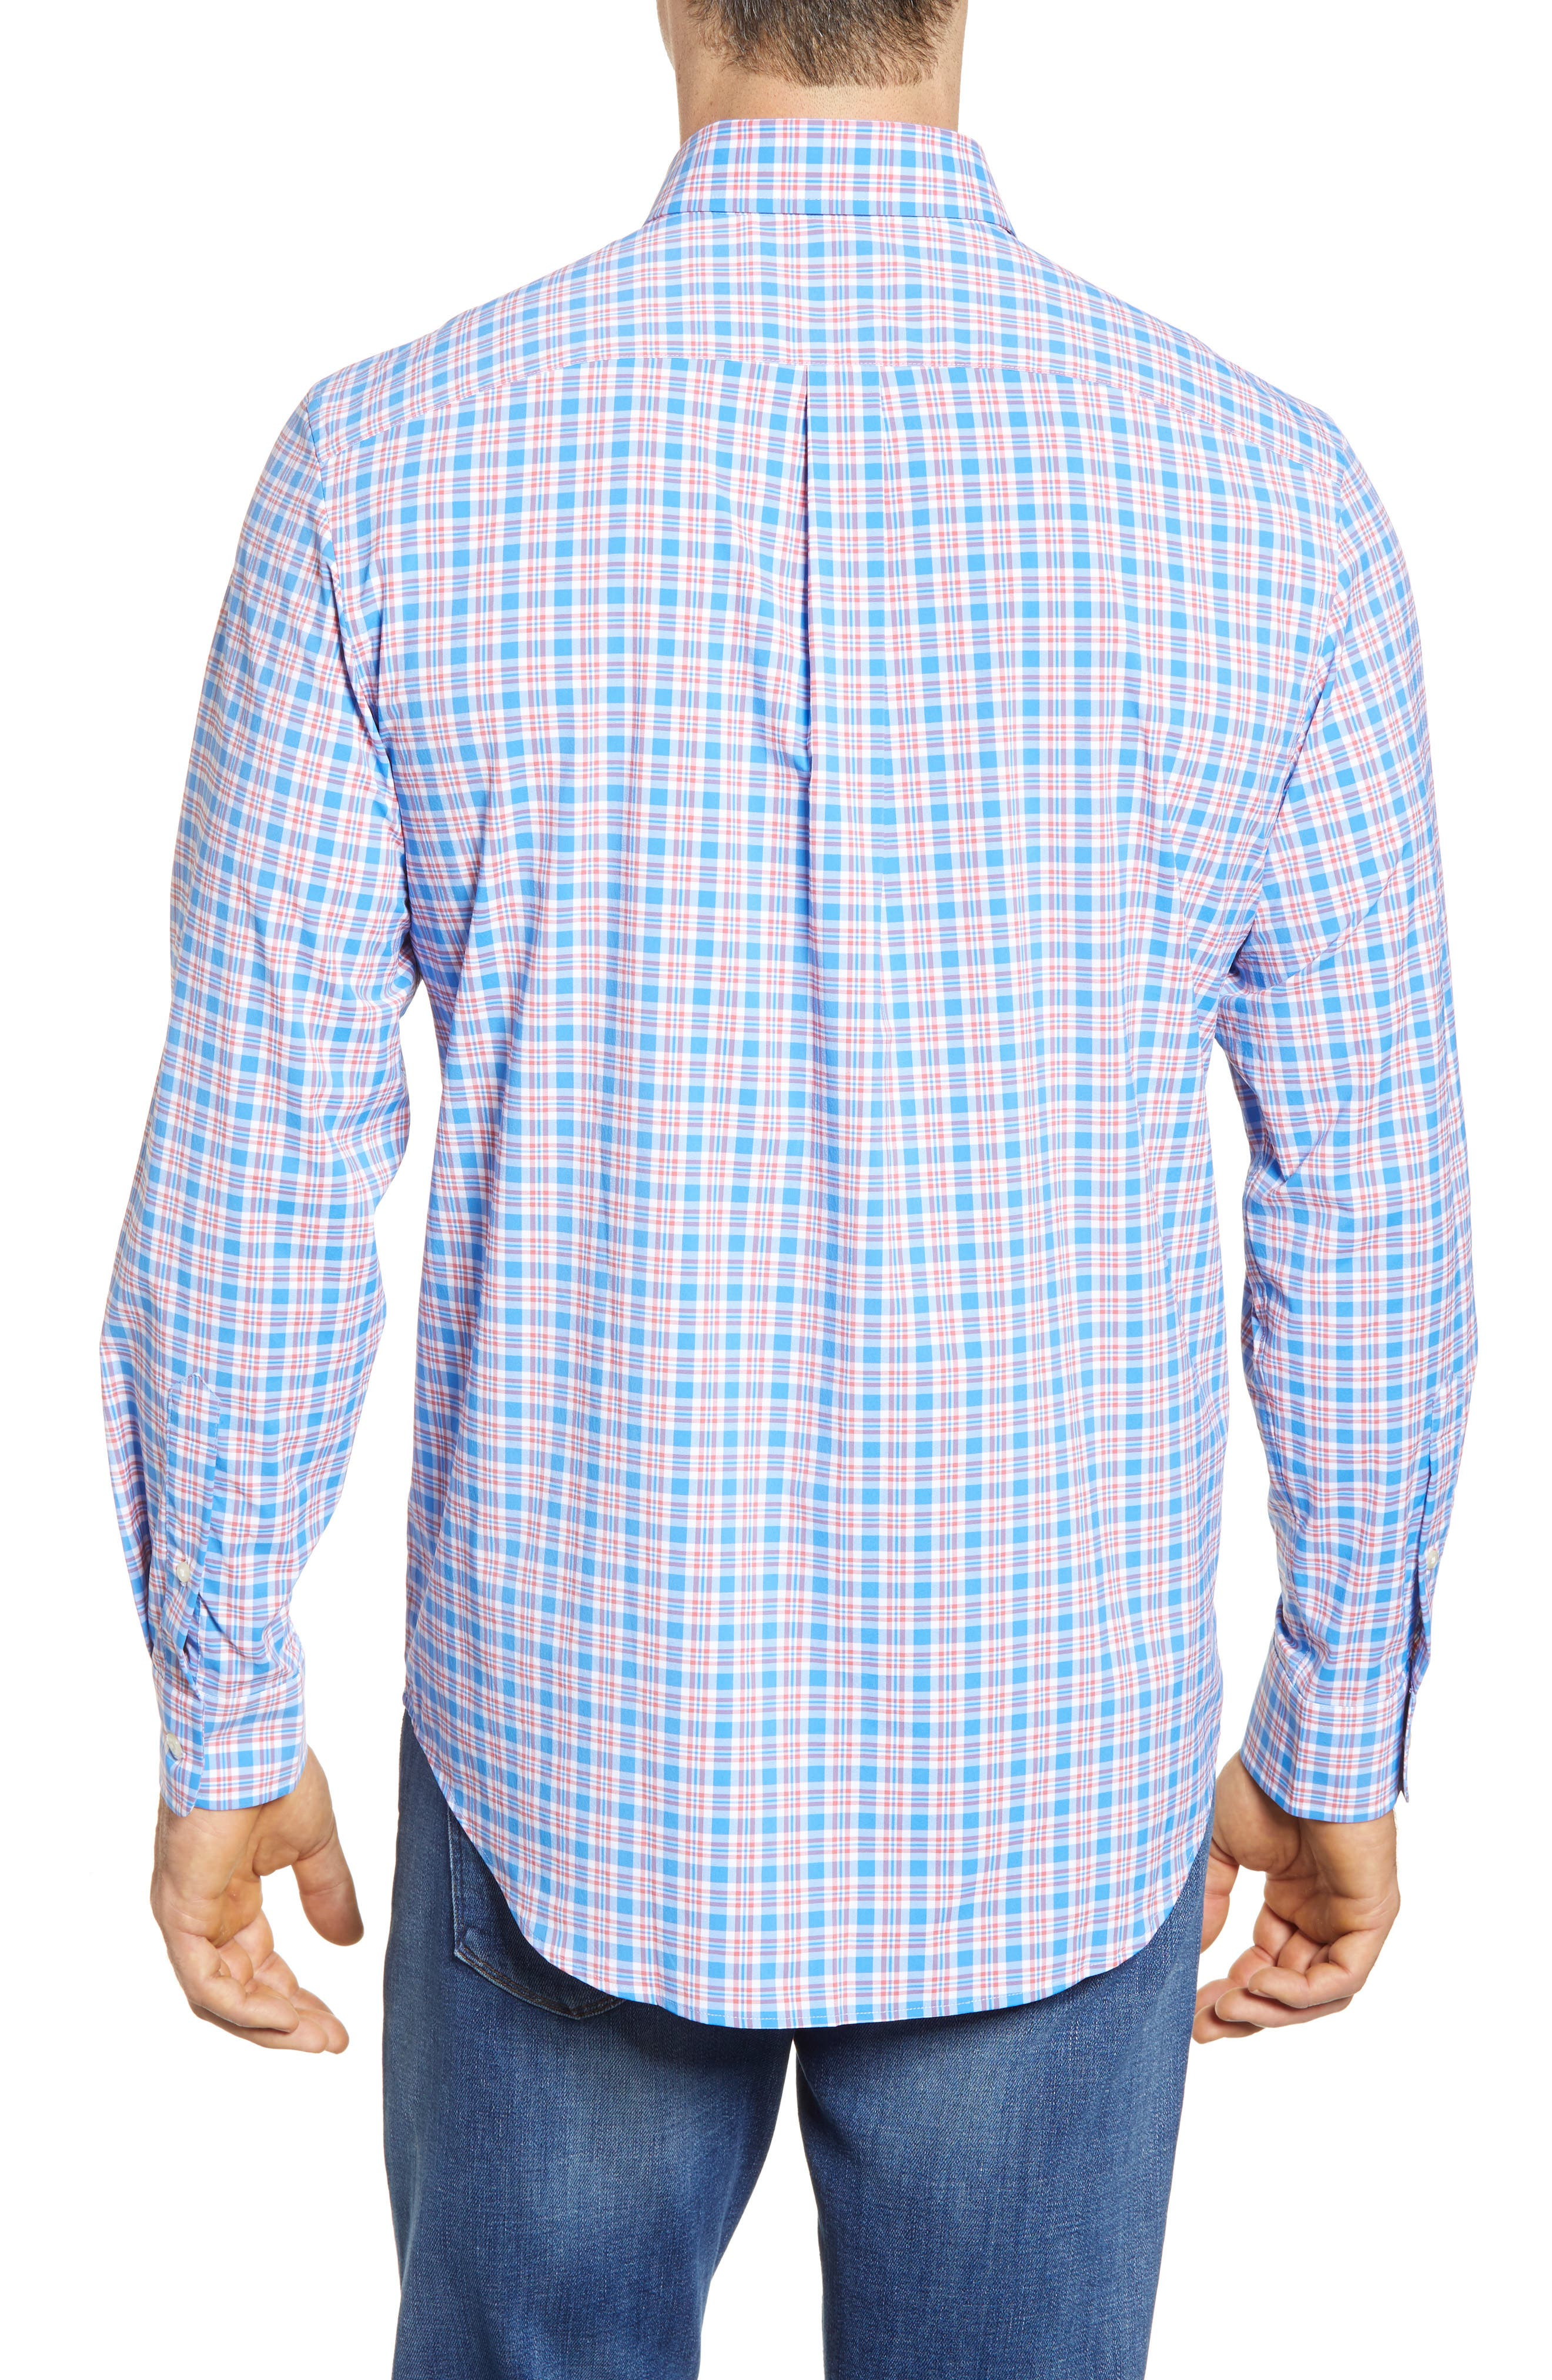 VINEYARD VINES,                             Lighthouse Road Regular Fit Plaid Sport Shirt,                             Alternate thumbnail 3, color,                             415